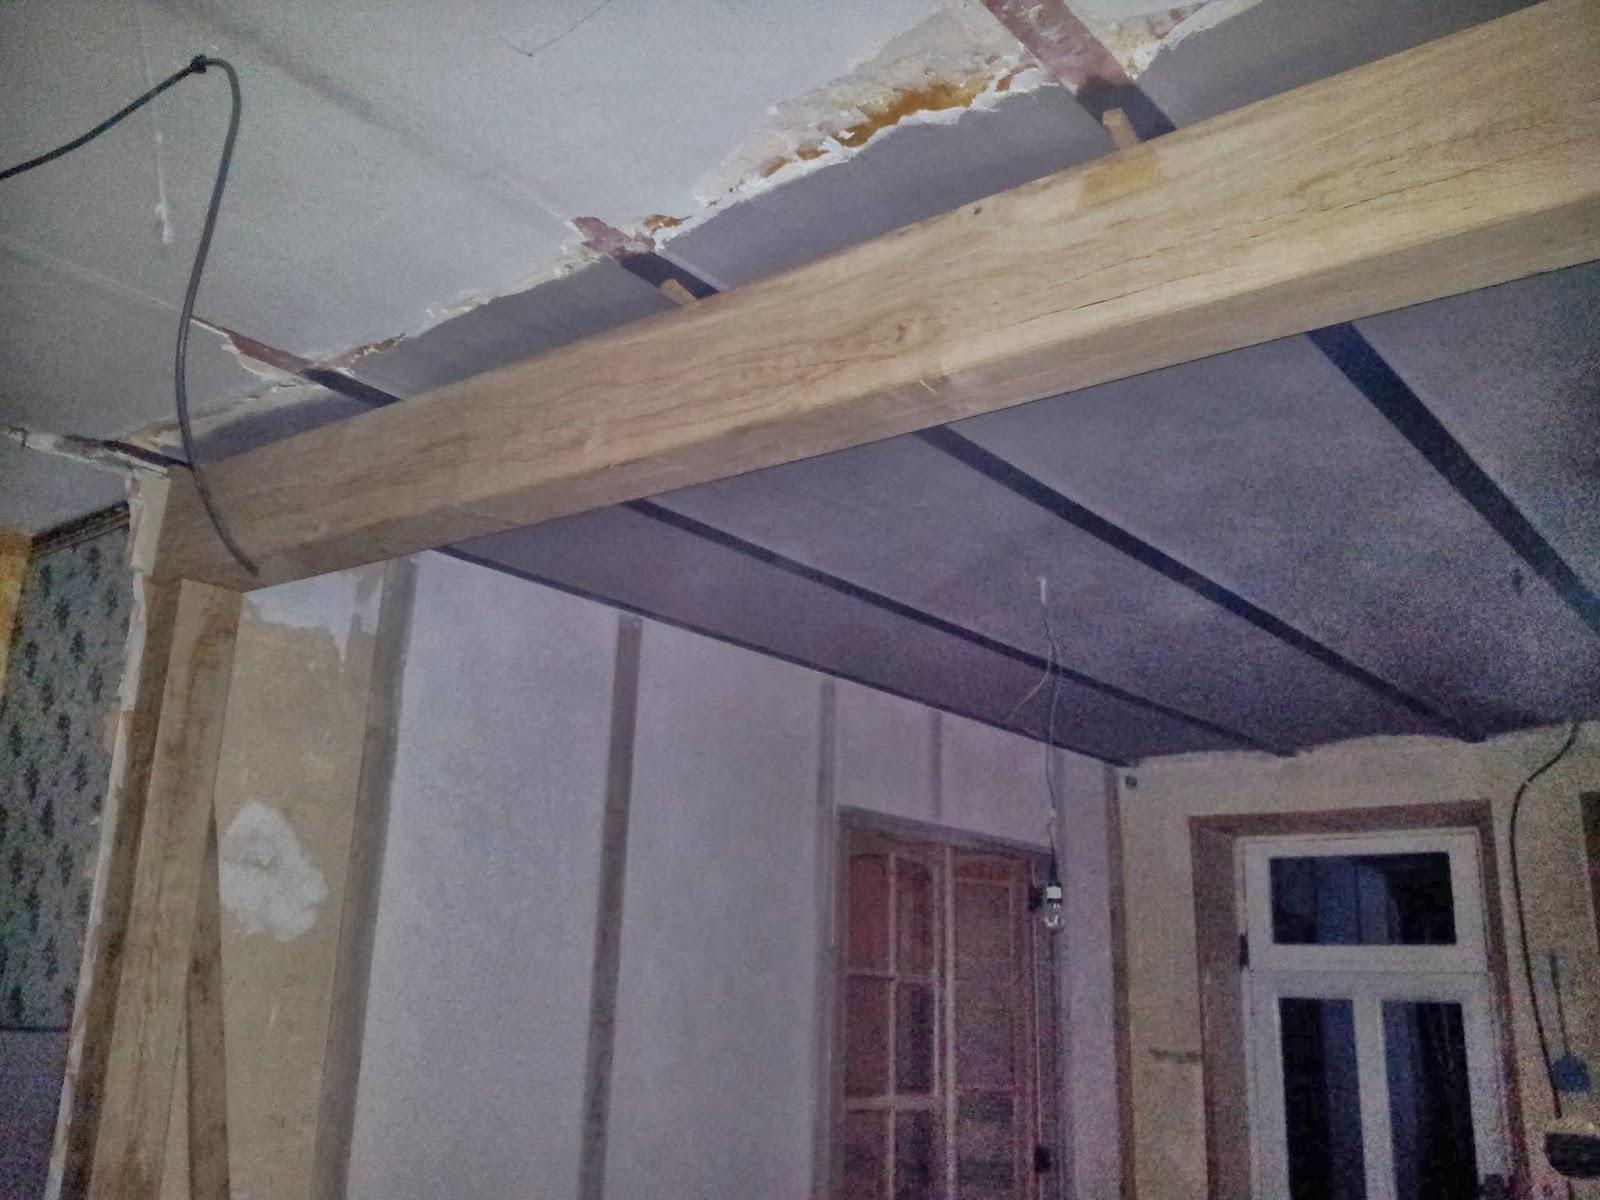 M nessaire januari 2014 - Plafond met balk ...